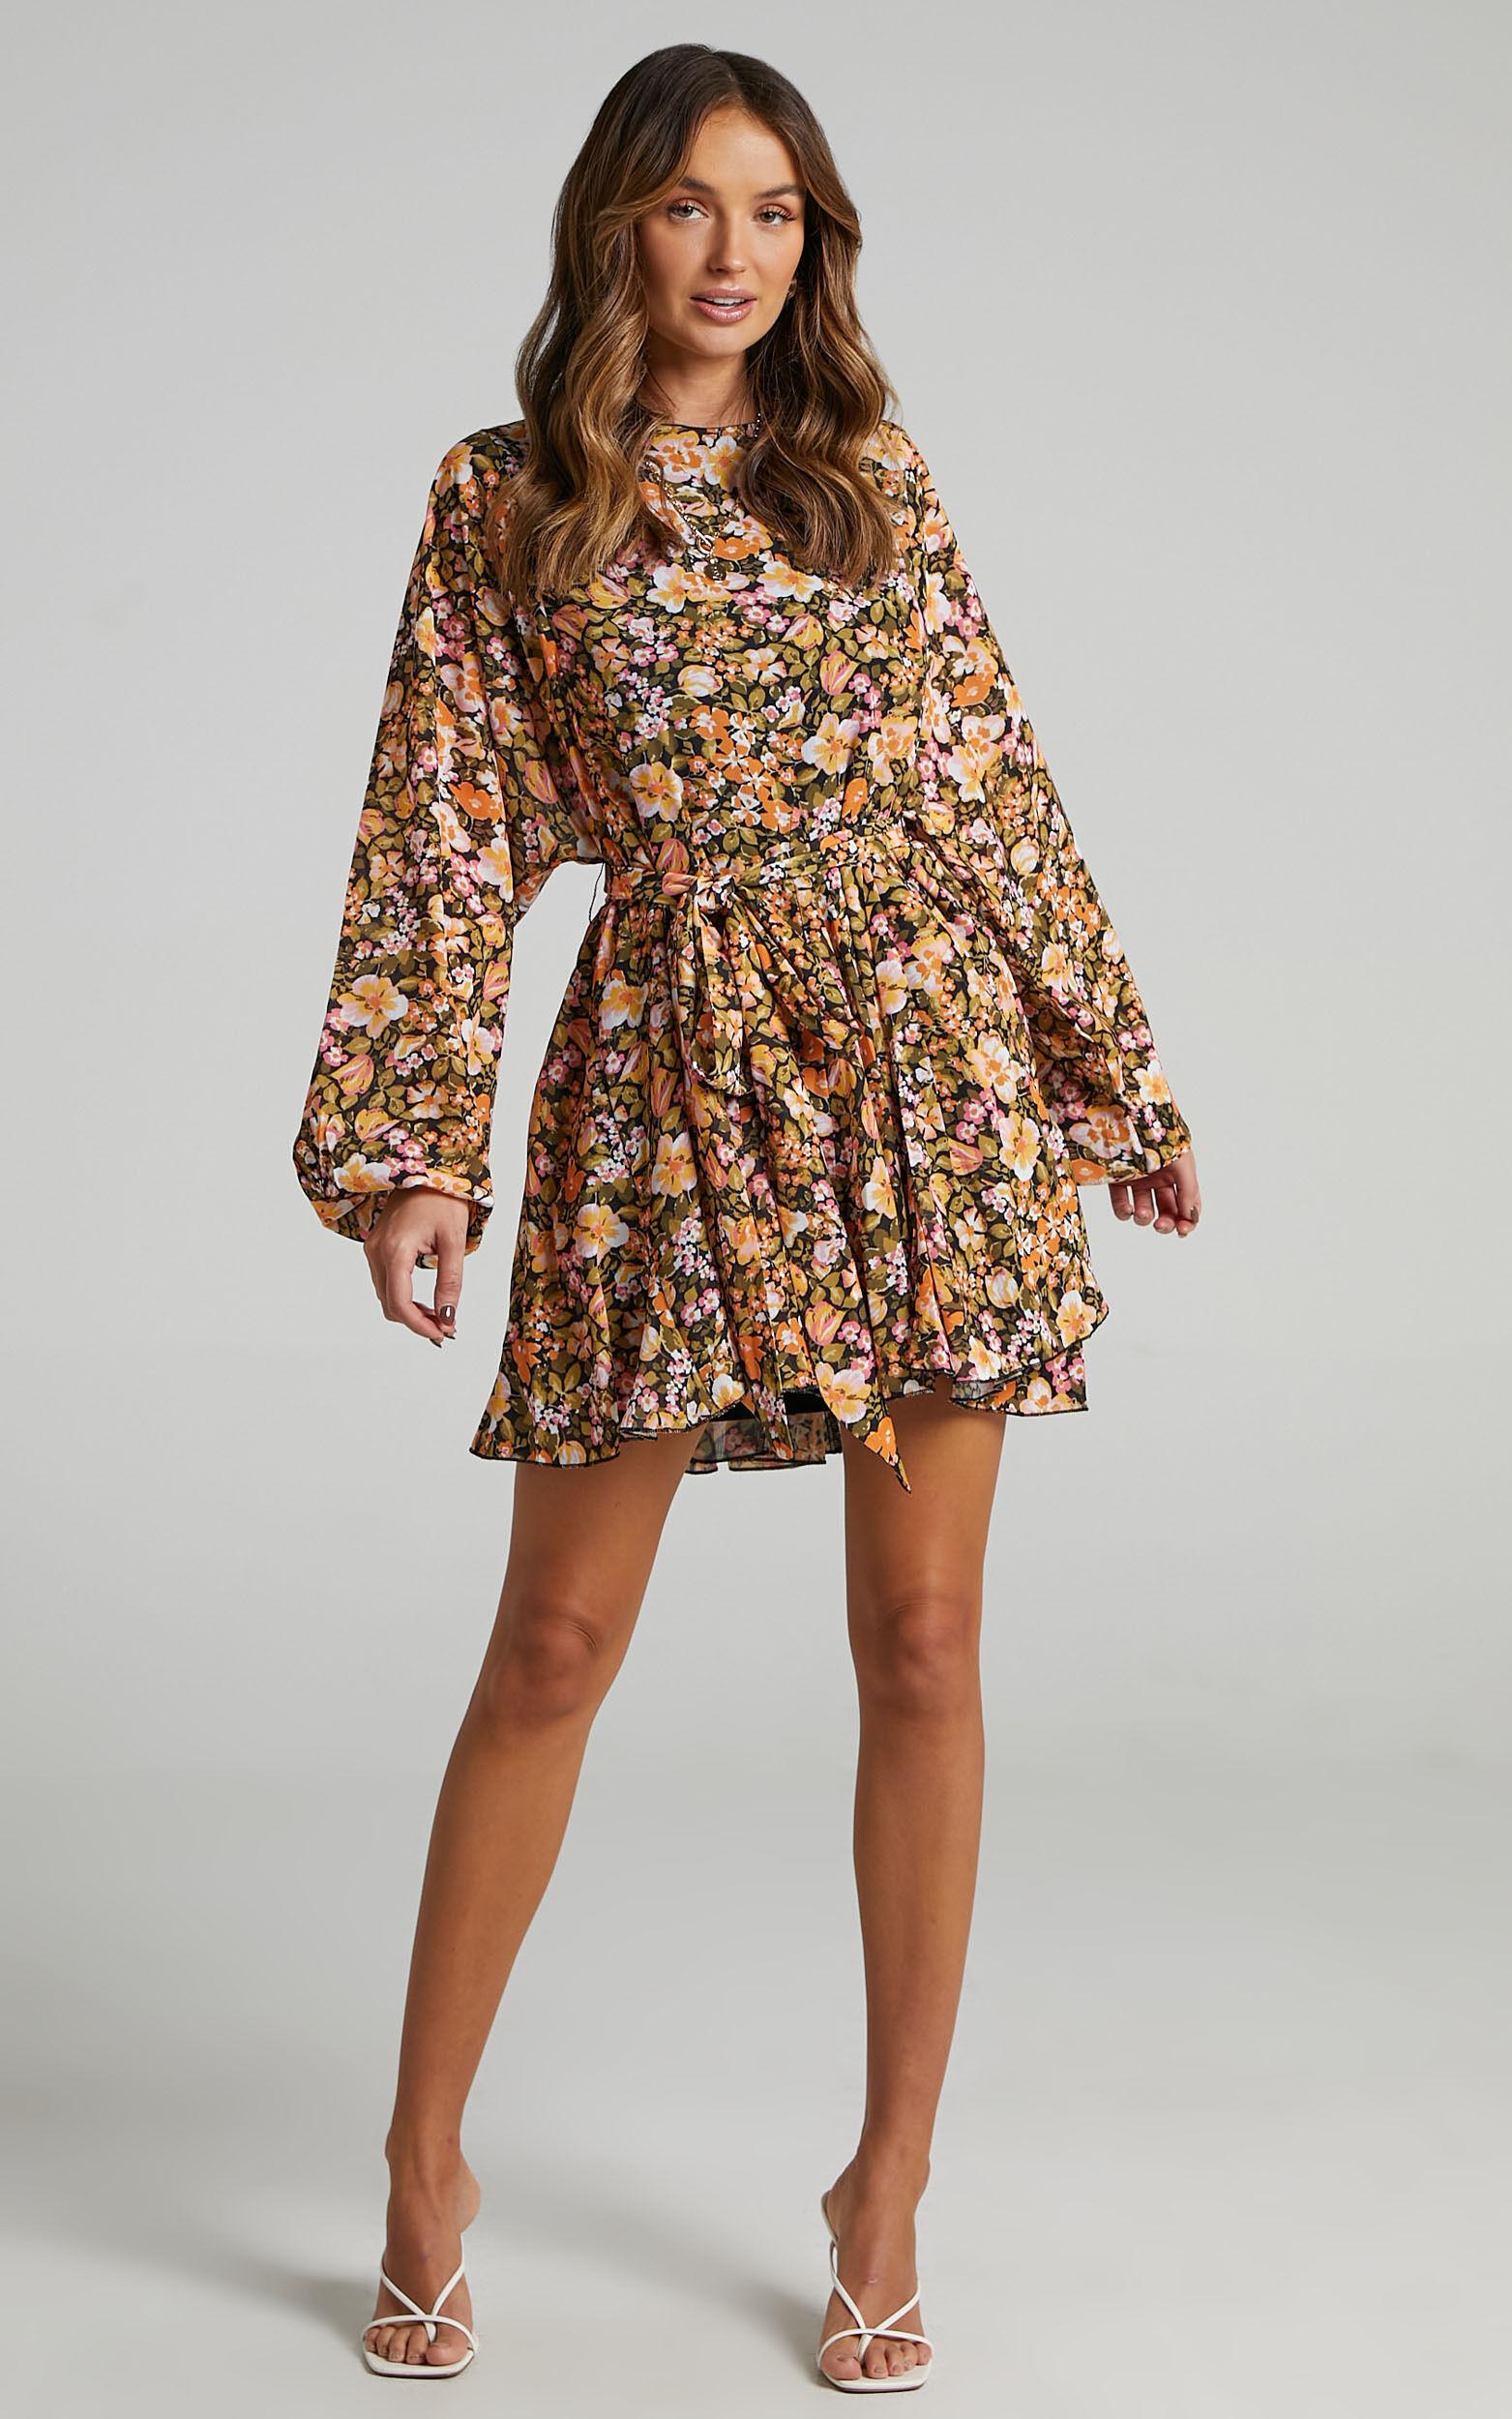 Ancora Tie Front Longsleeve Mini Dress in Black Floral - 06, BLK3, super-hi-res image number null